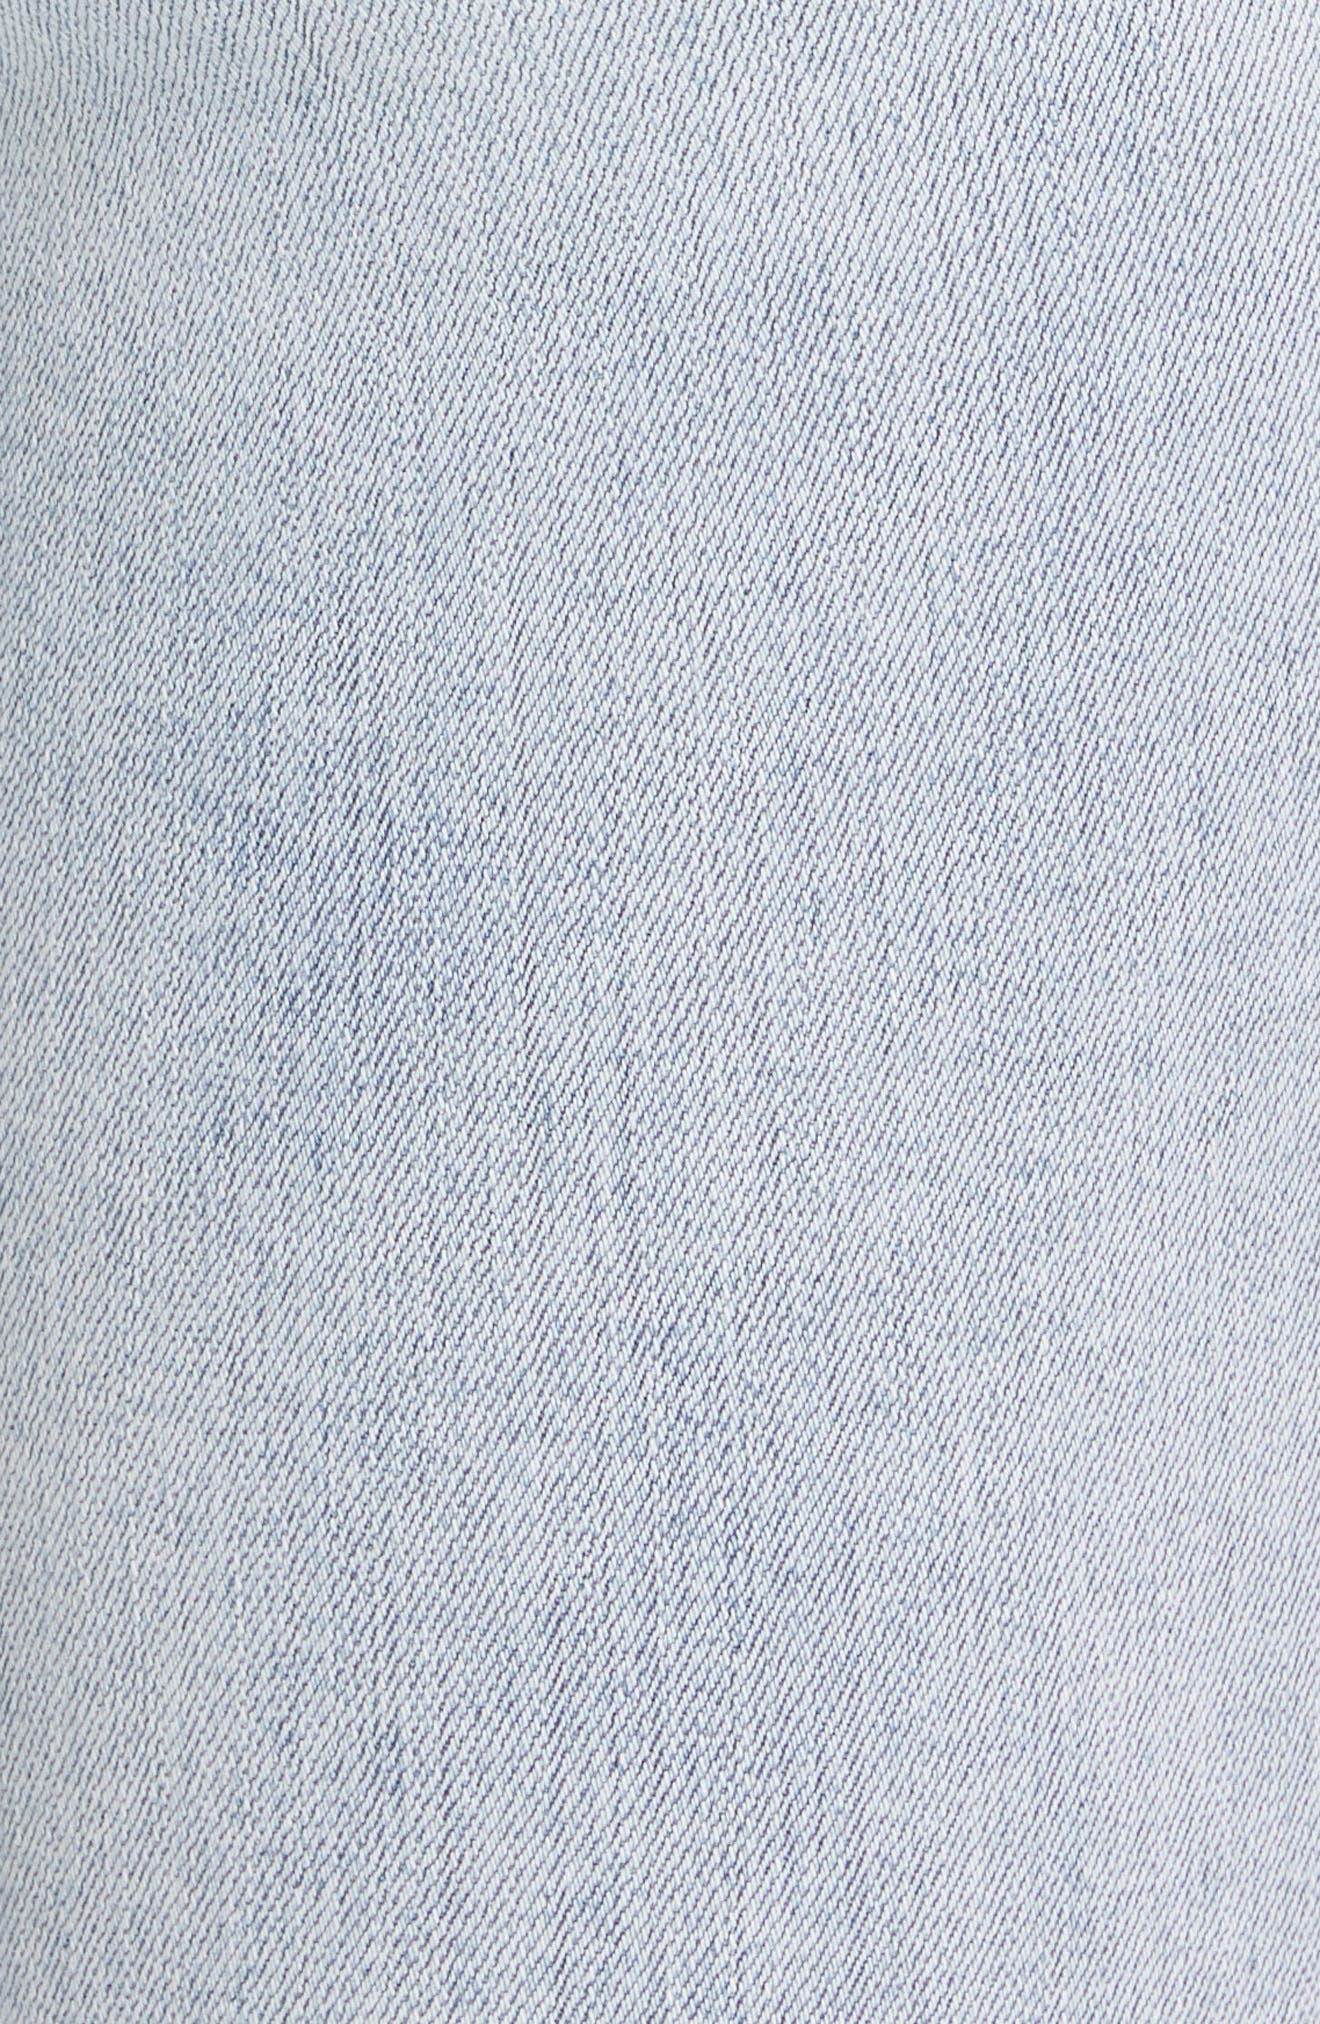 RAG & BONE, JEAN Ripped Ankle Skinny Jeans, Alternate thumbnail 6, color, 450